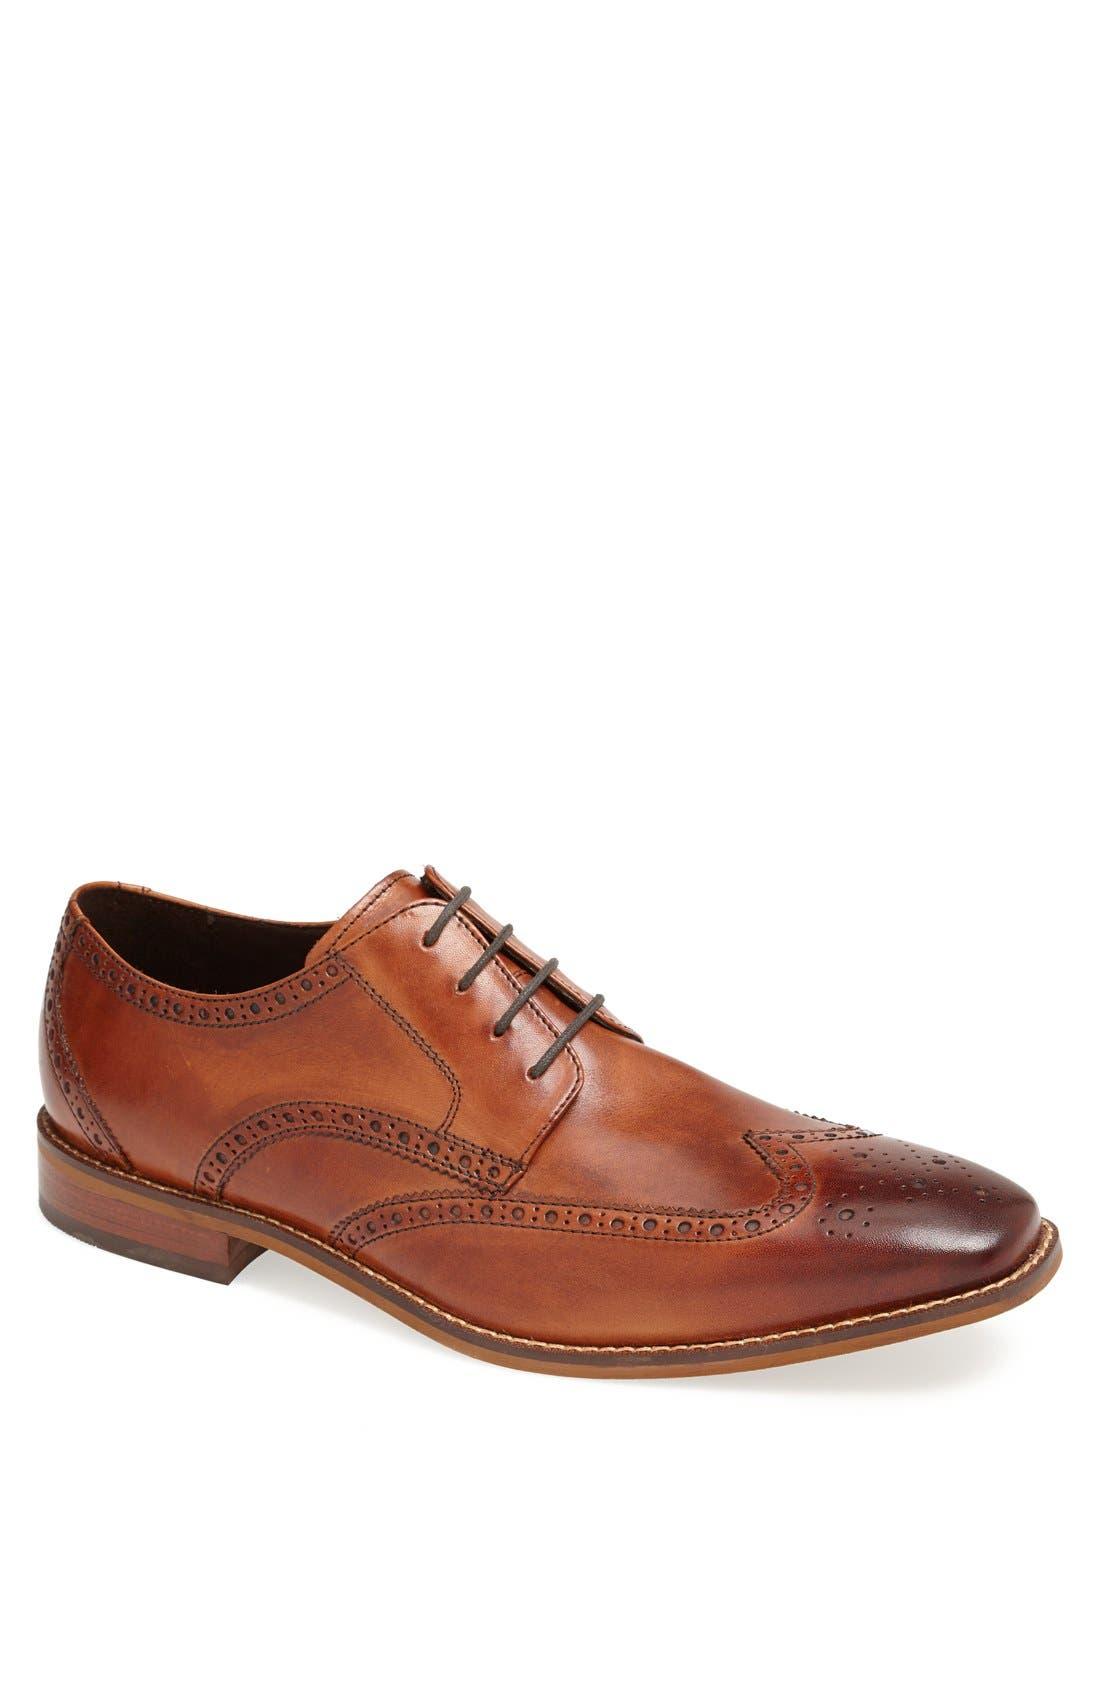 'Castellano' Wingtip,                         Main,                         color, Saddle Tan